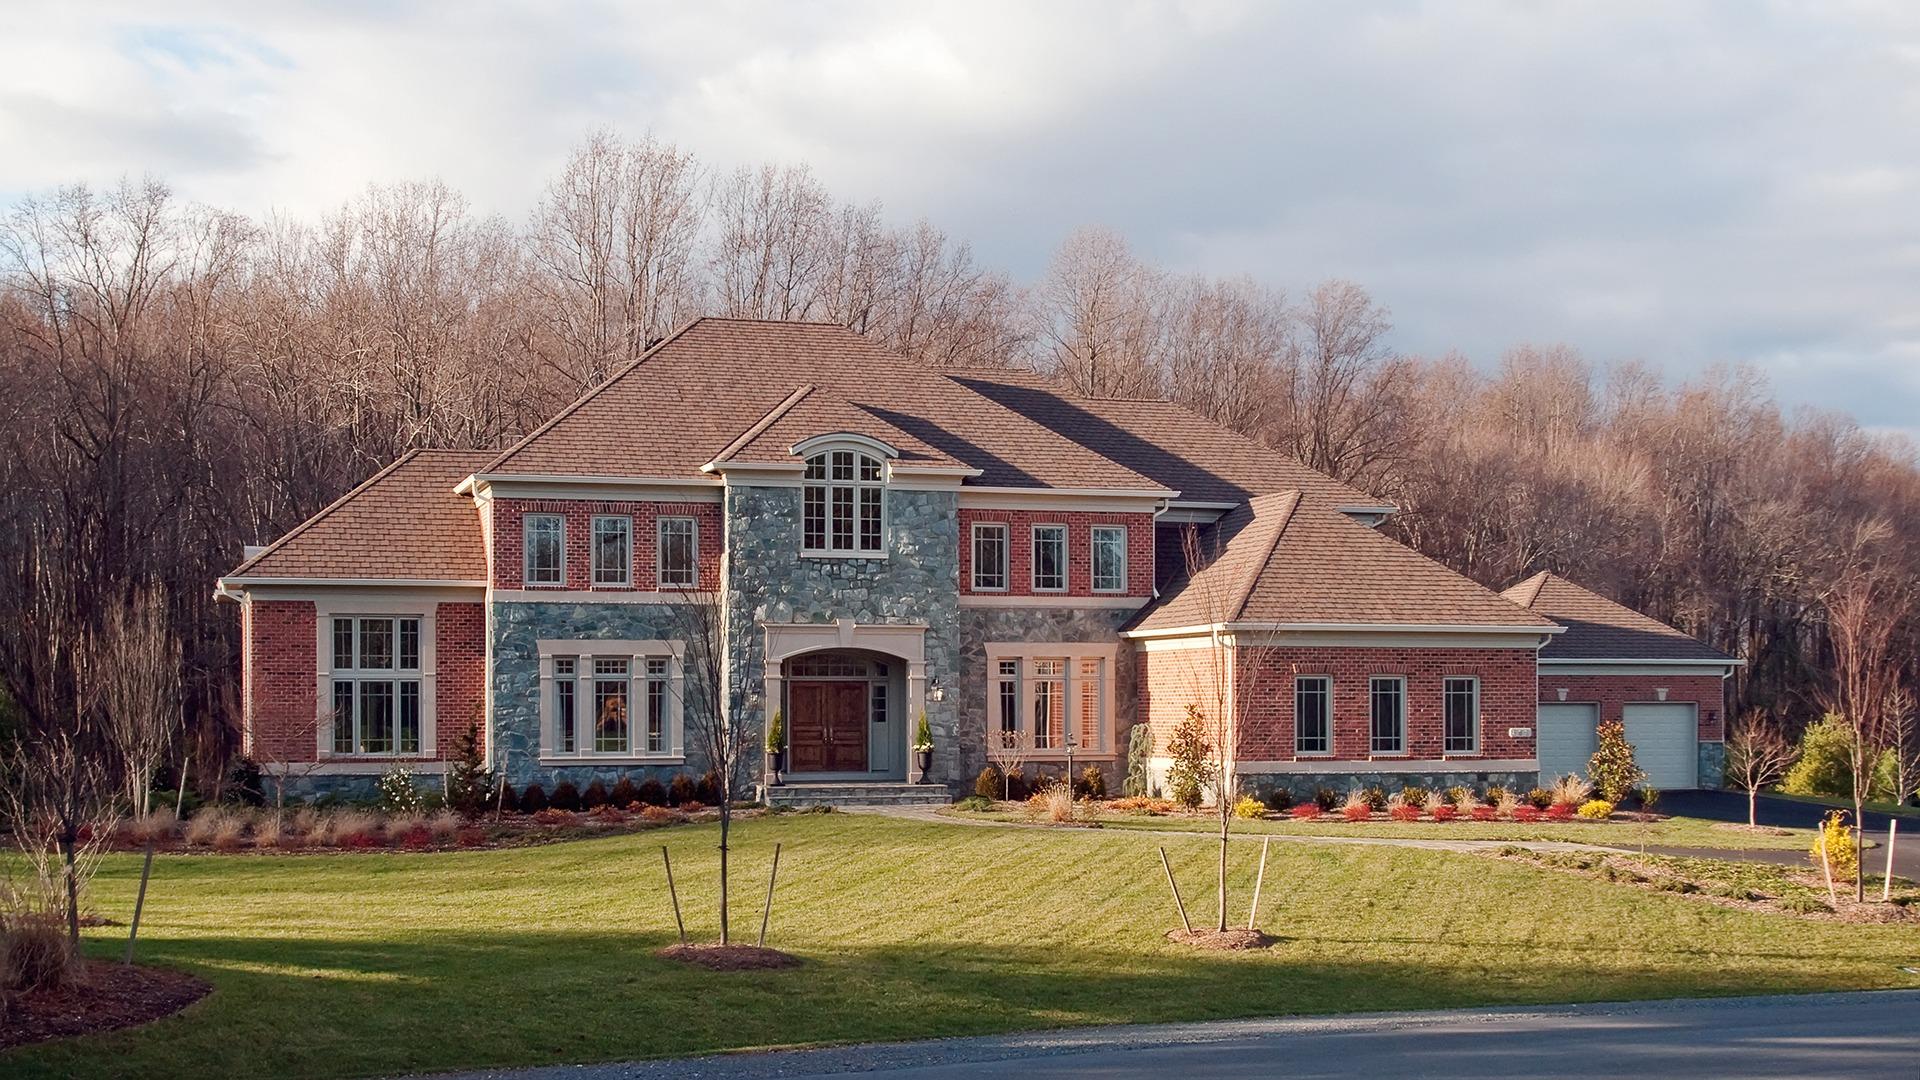 Grovemont Winthrop - Exterior